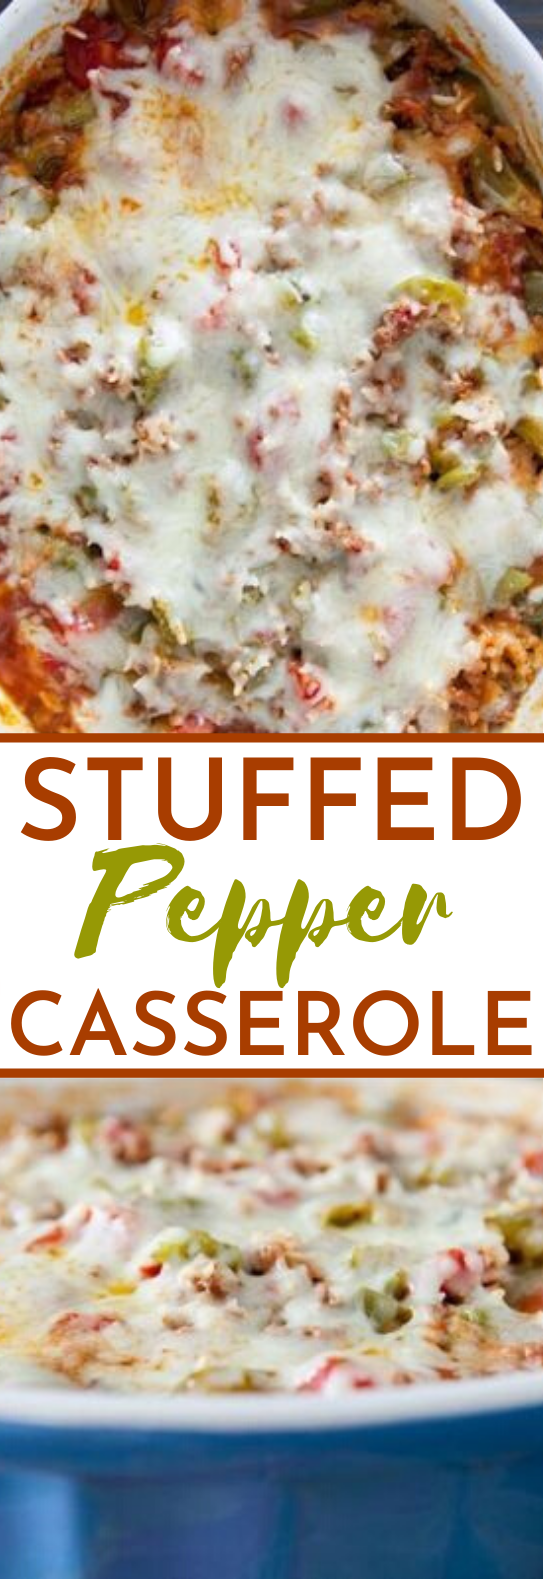 Stuffed Pepper Casserole #dinner #casserole #comfortfood #easy #recipes